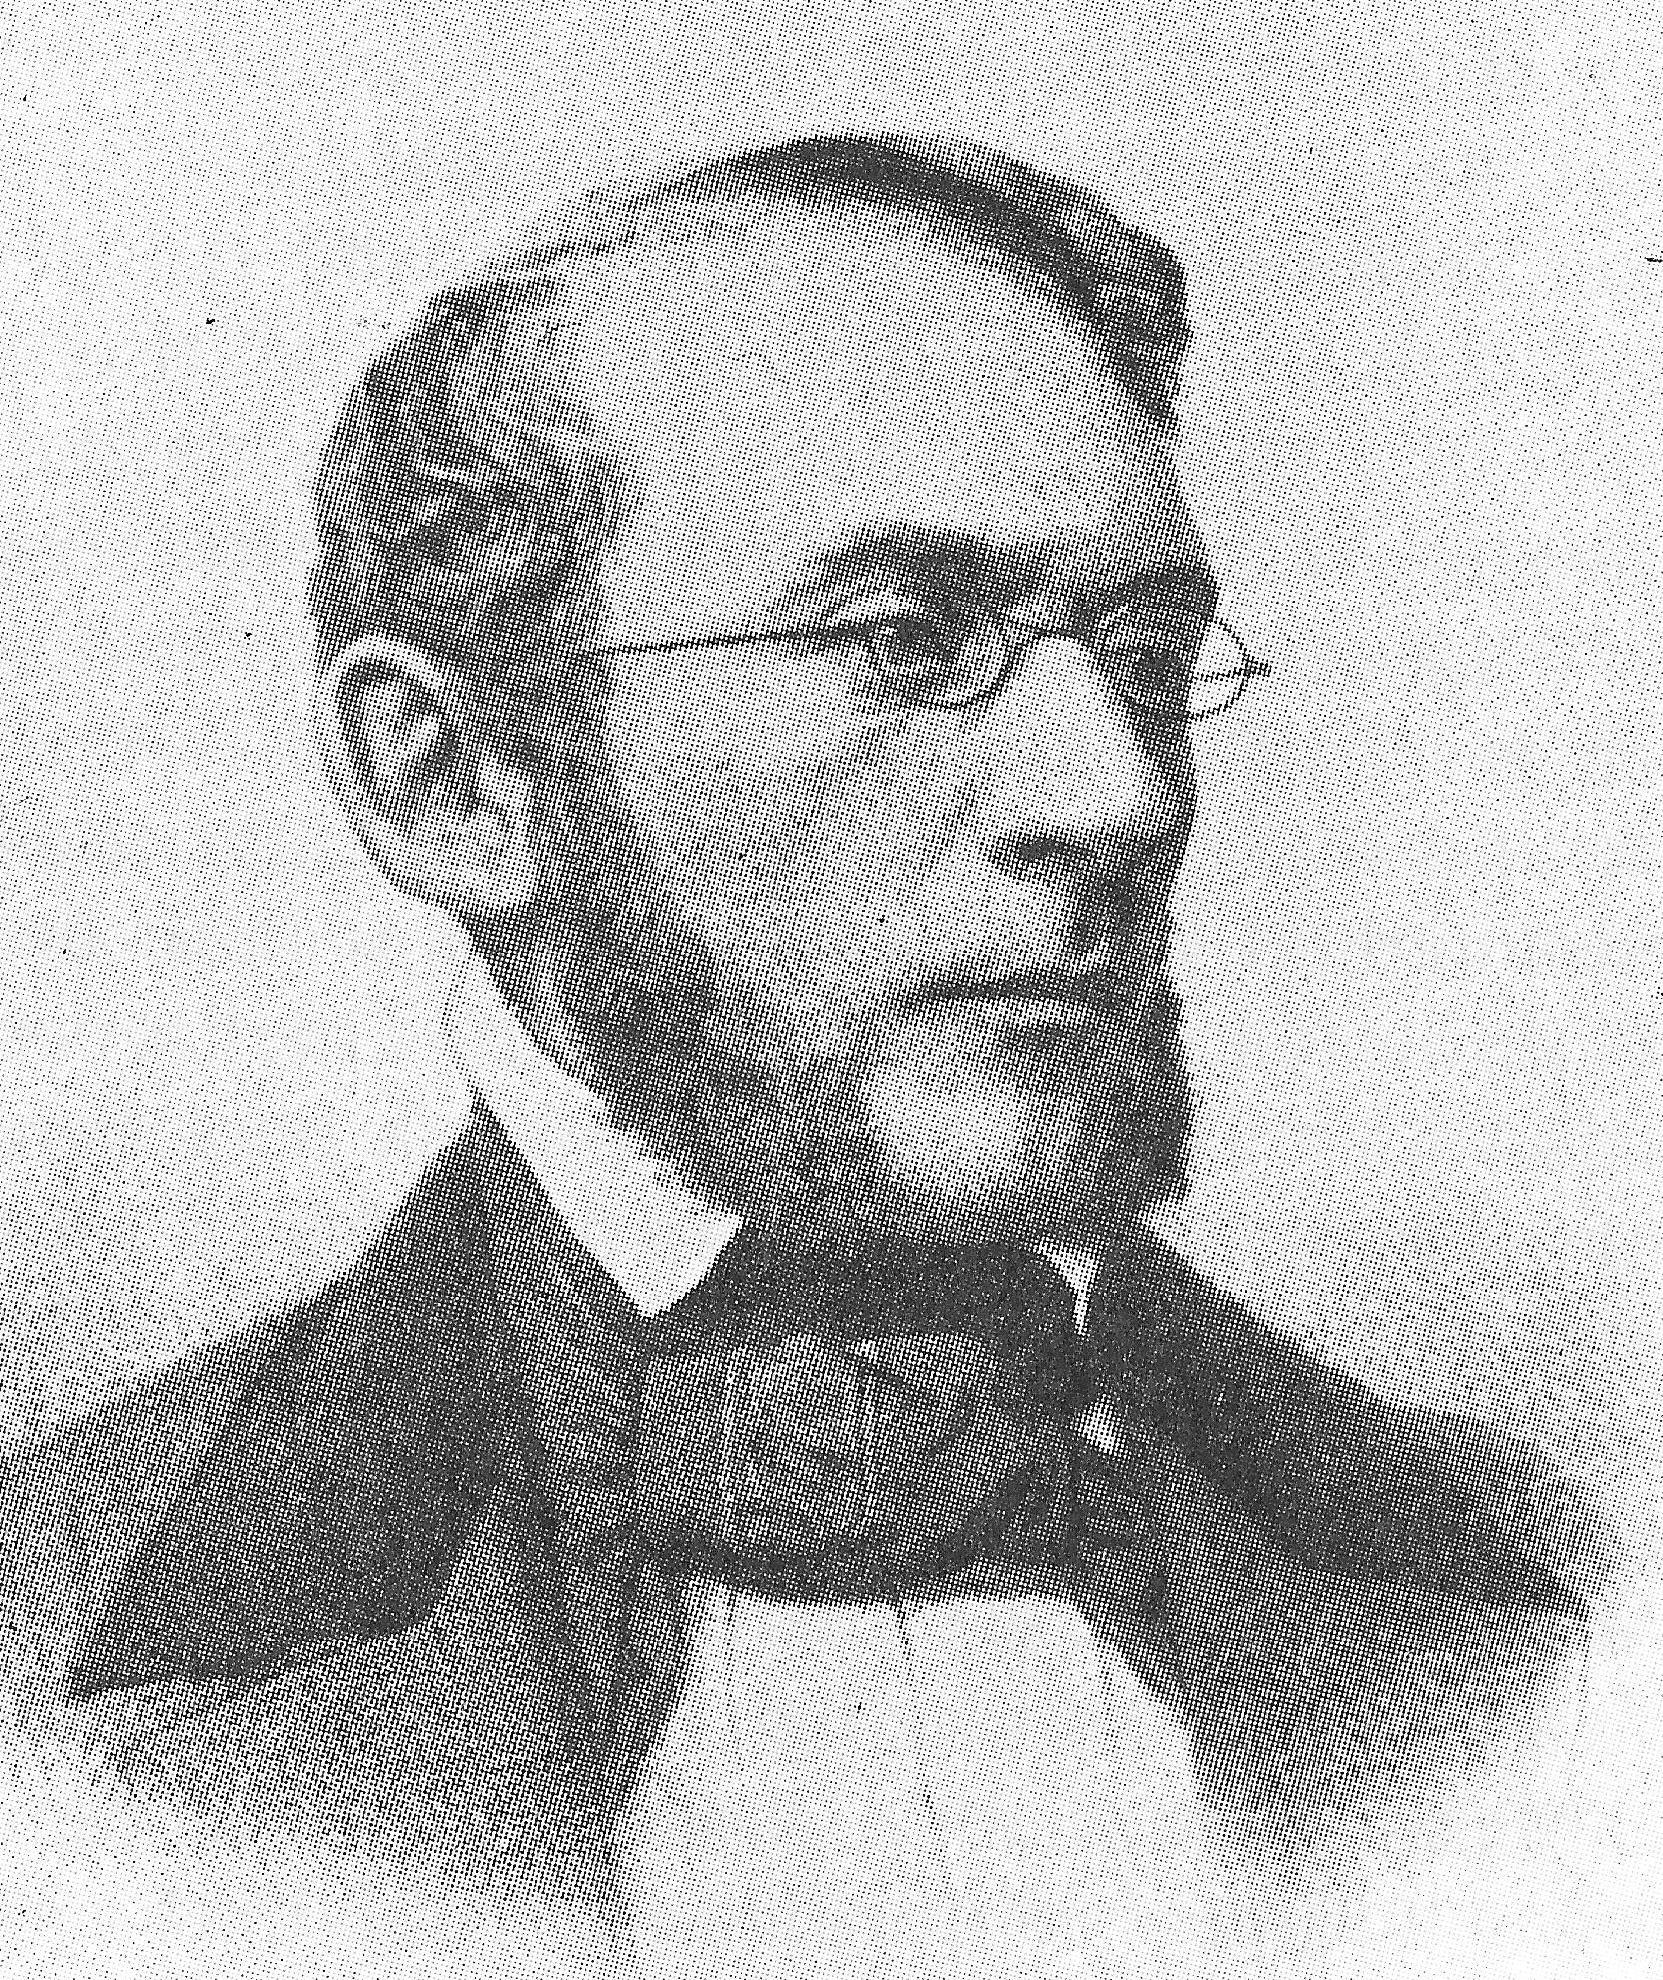 Lothar Bucher.